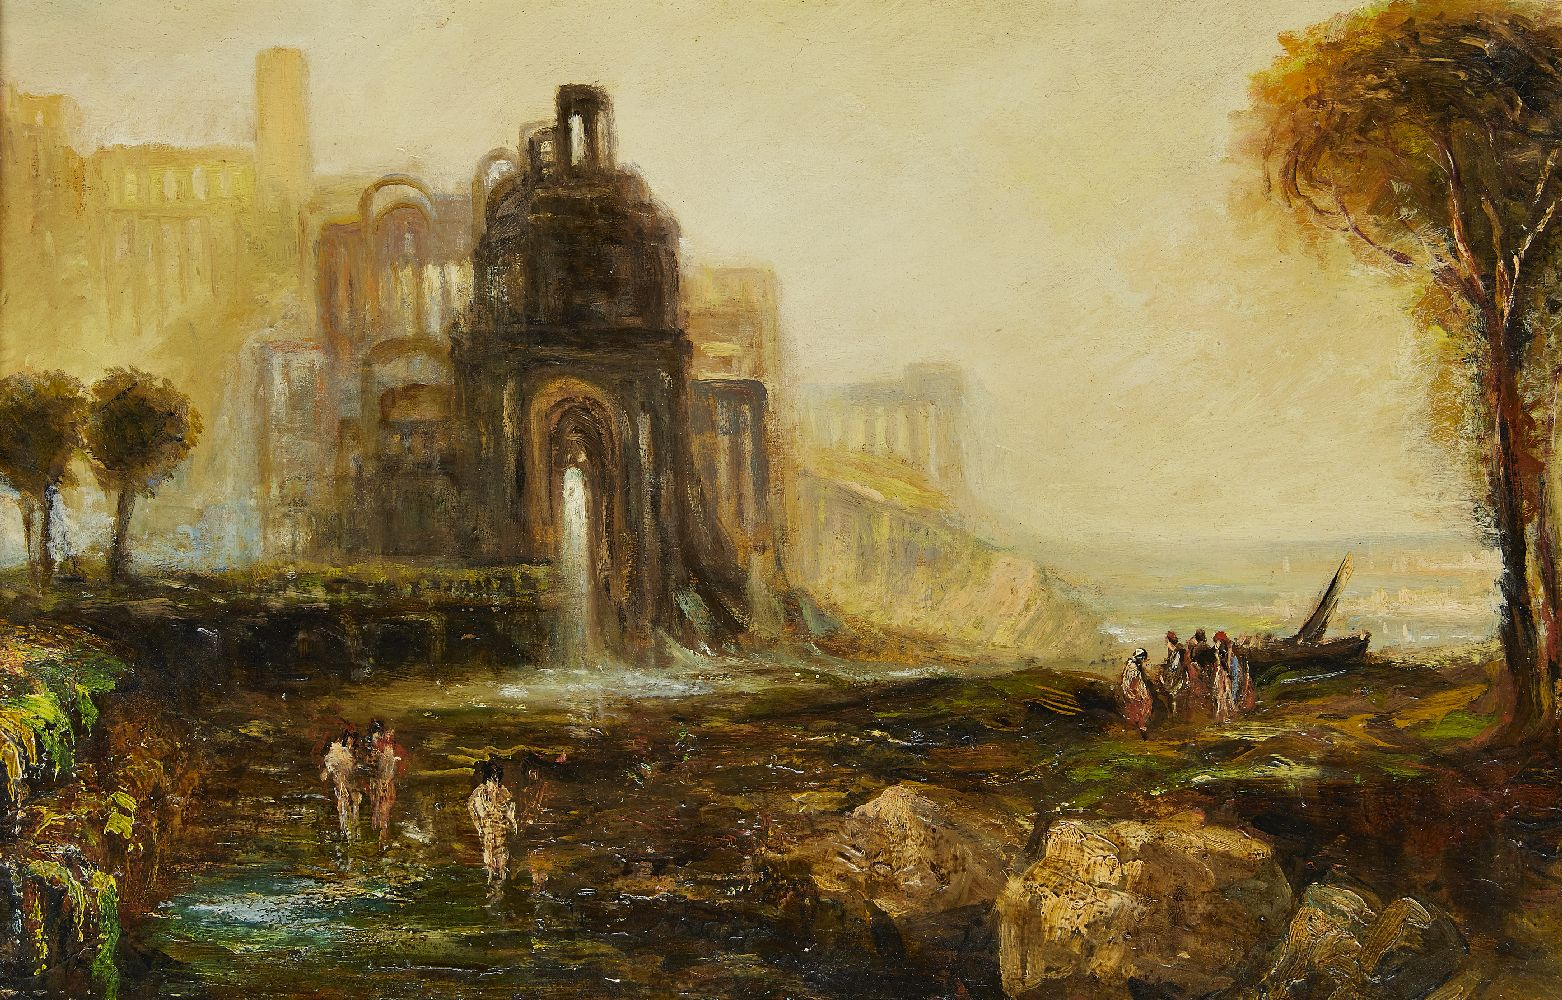 After Joseph Mallord William Turner RA, British 1775-1851- Caligula's Palace with Bridge; oil on